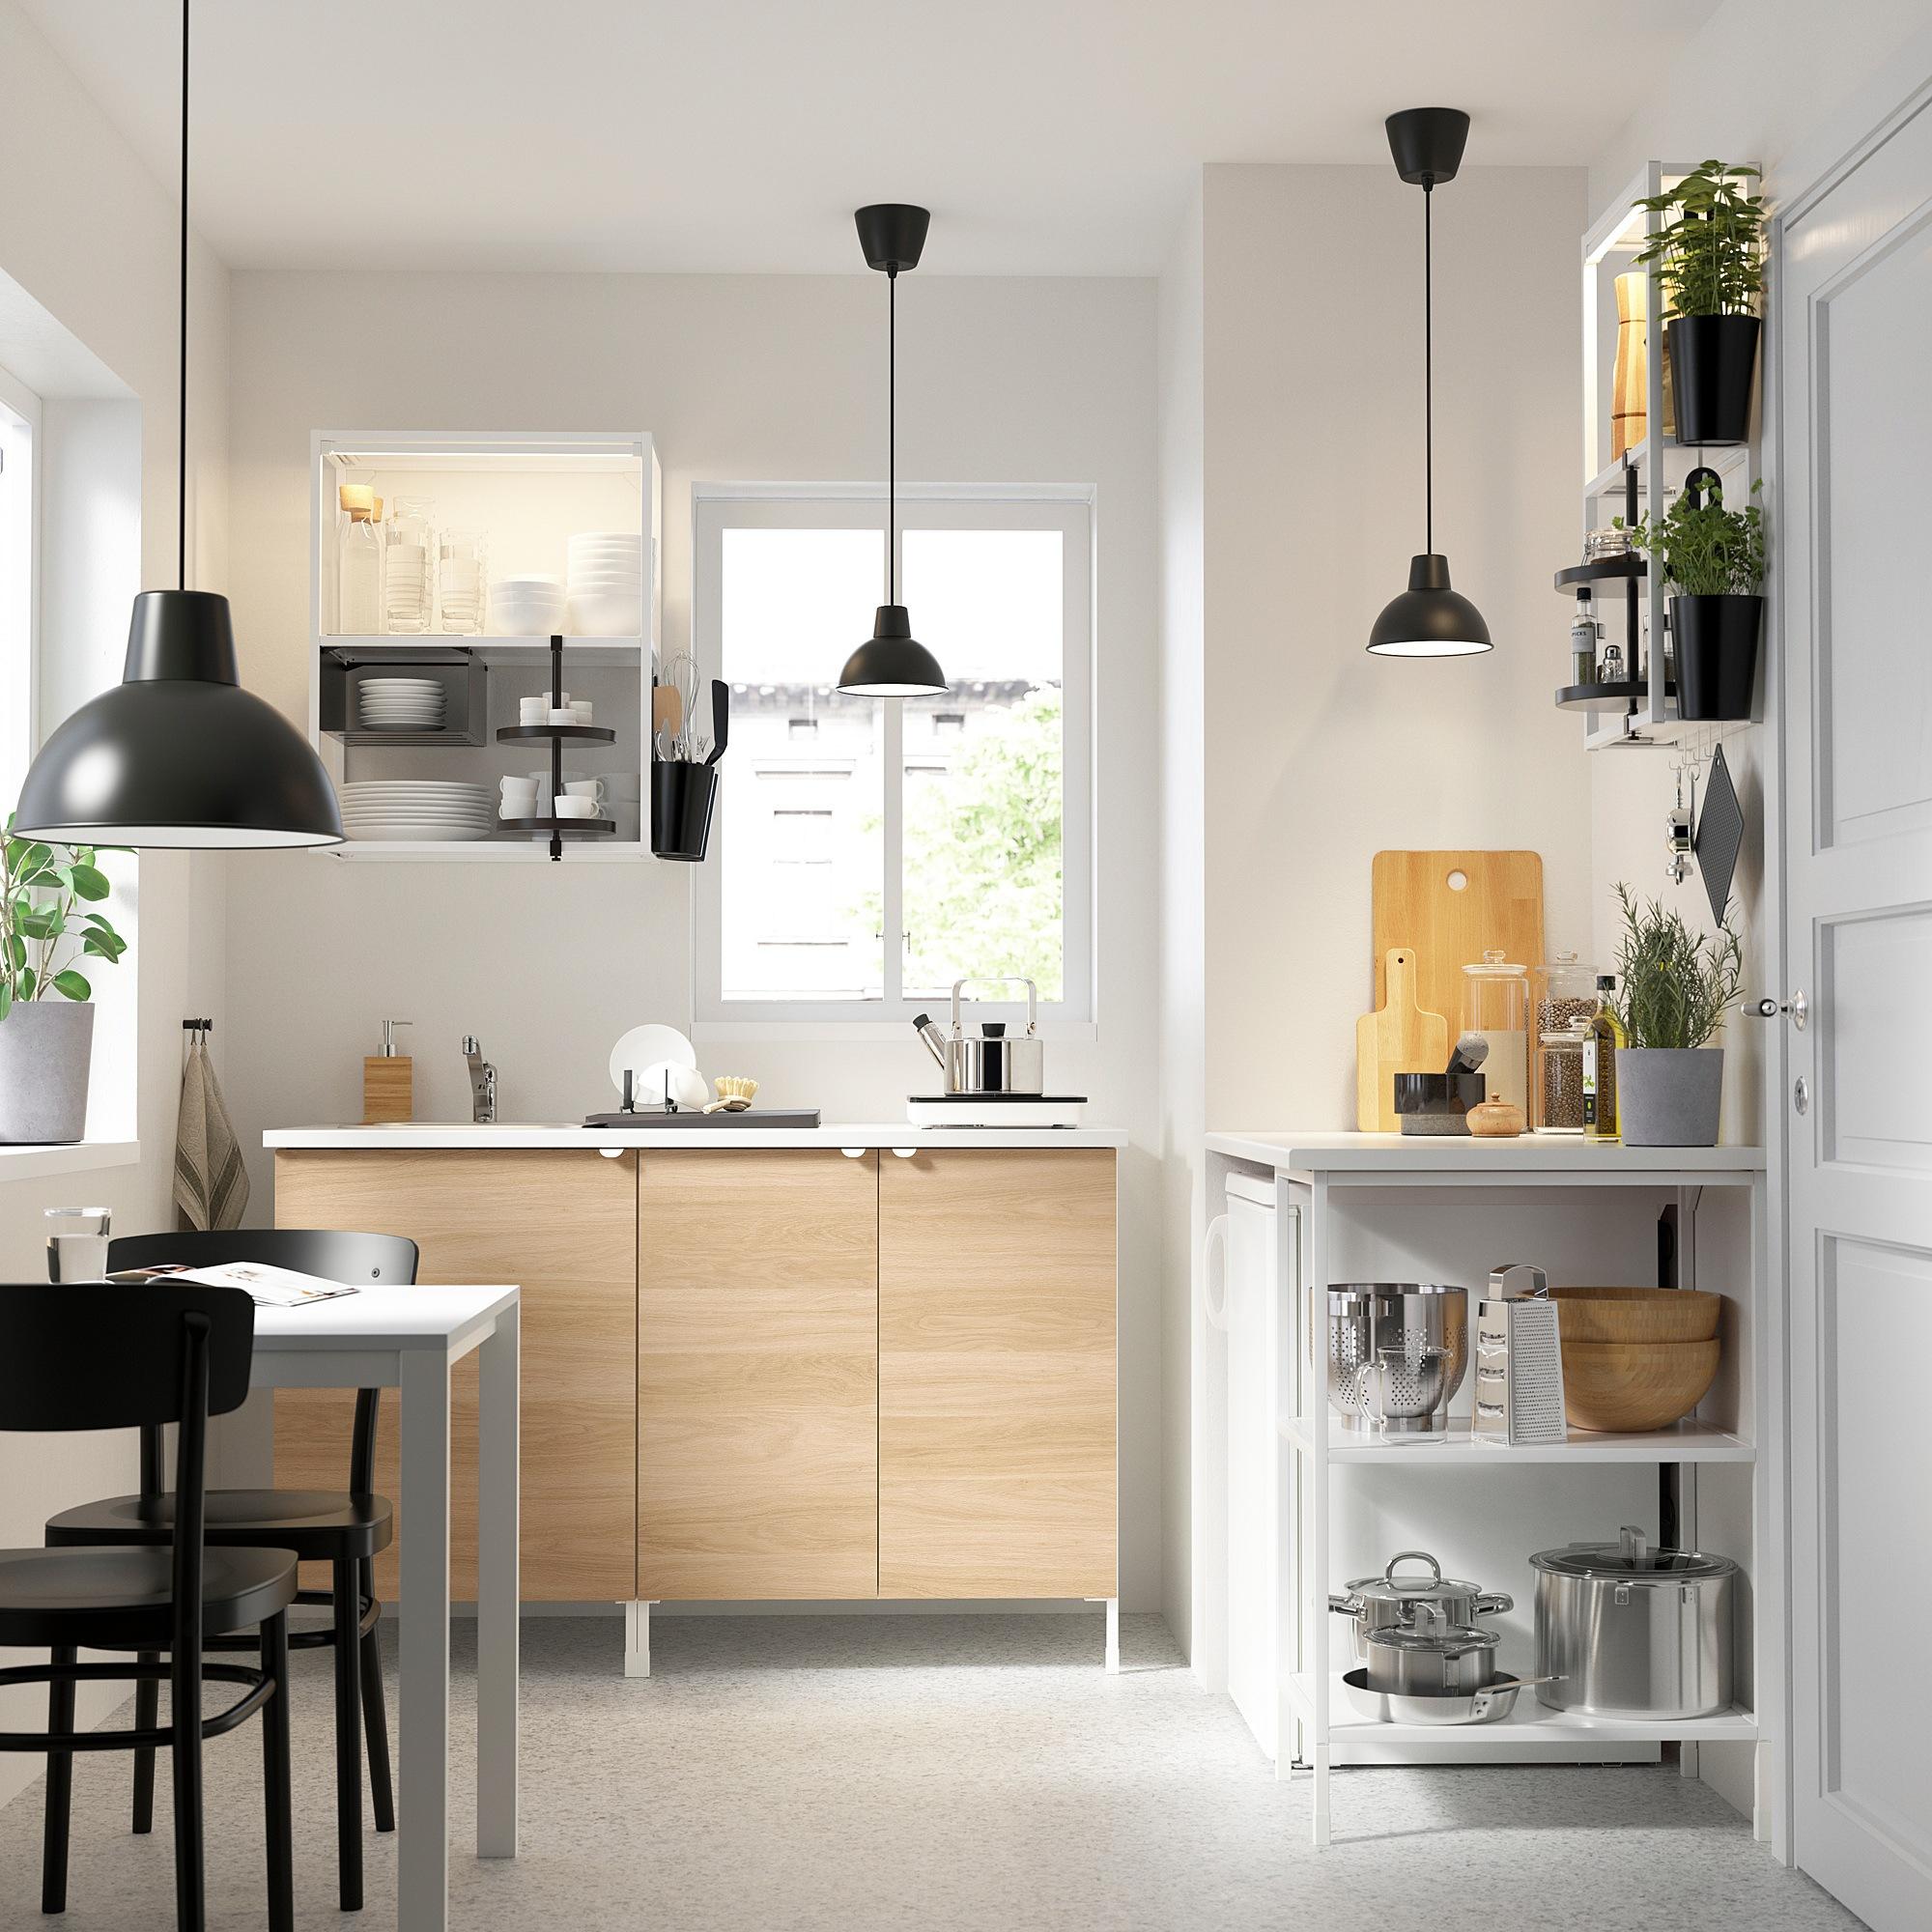 Küche & Kochbereich: Ideen & Inspirationen IKEA Deutschland